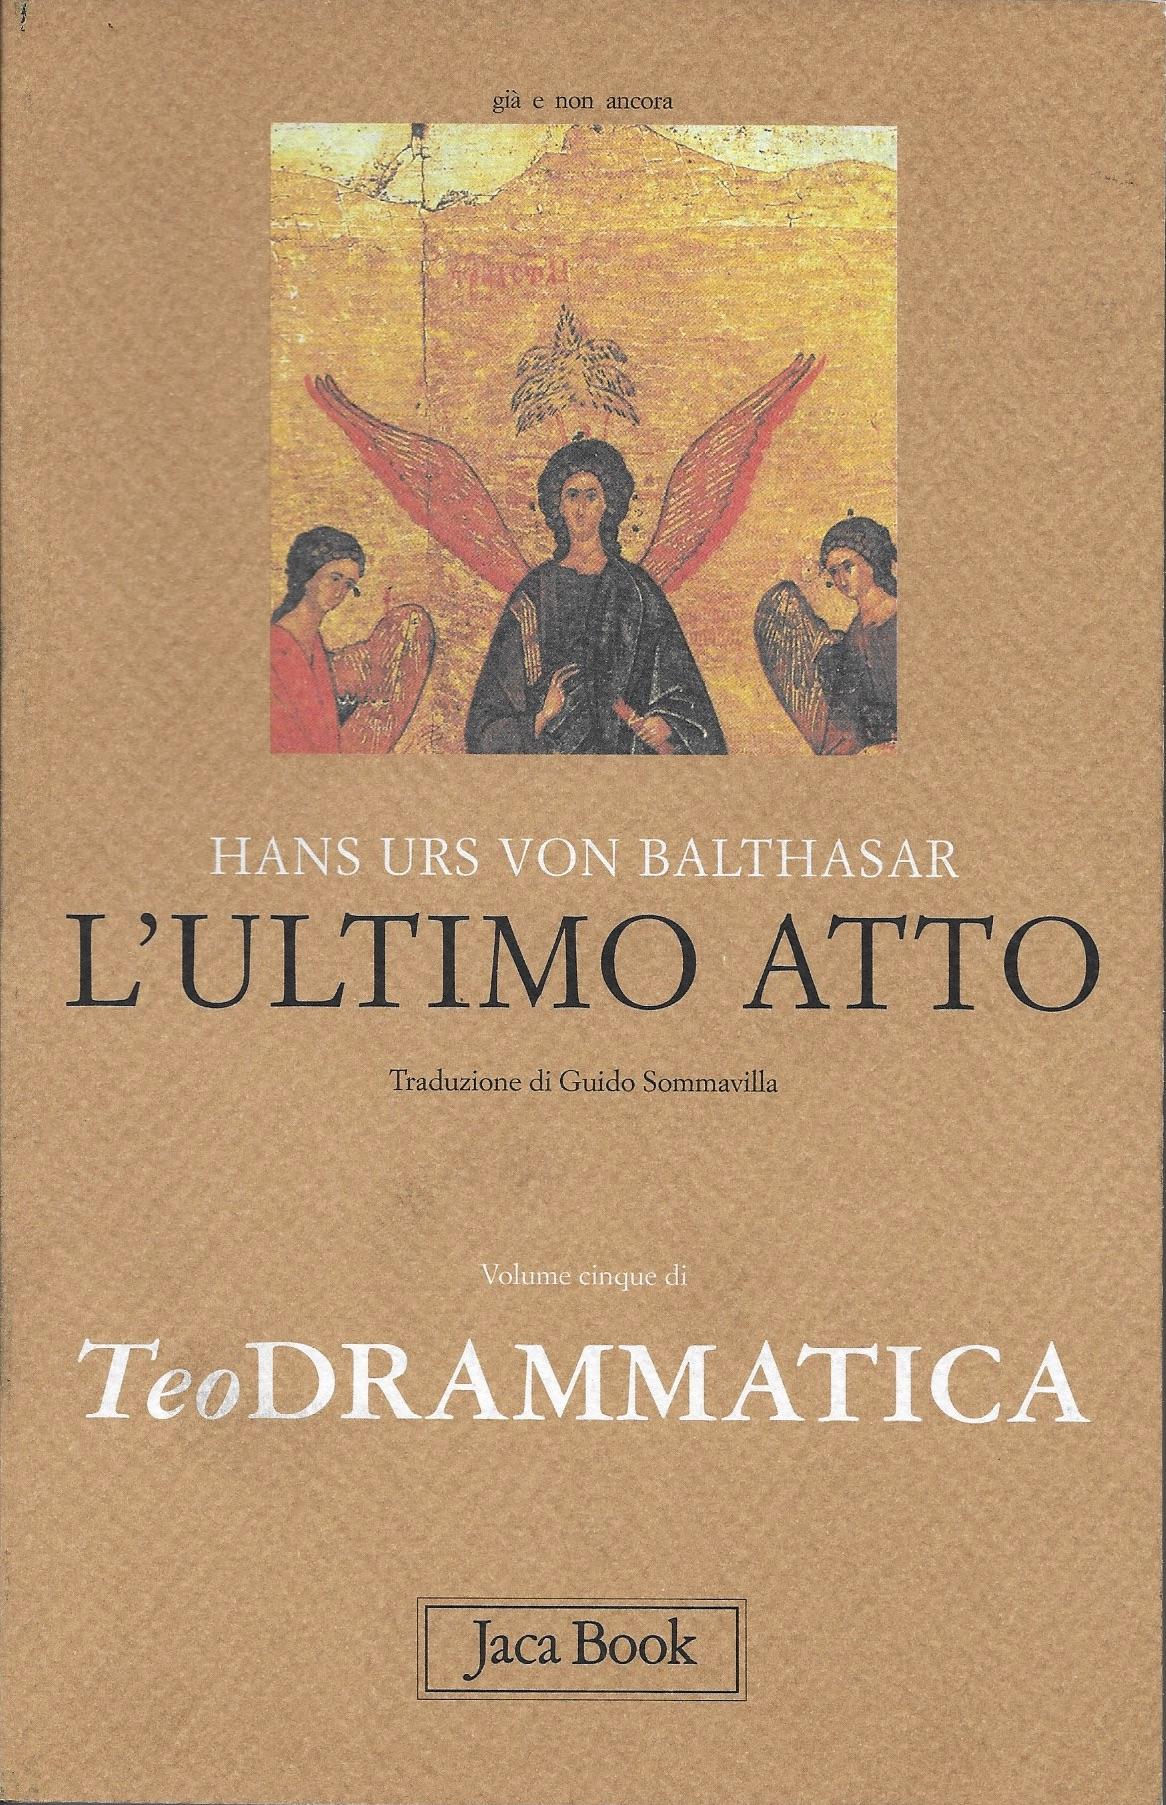 Teodrammatica - Vol. 5